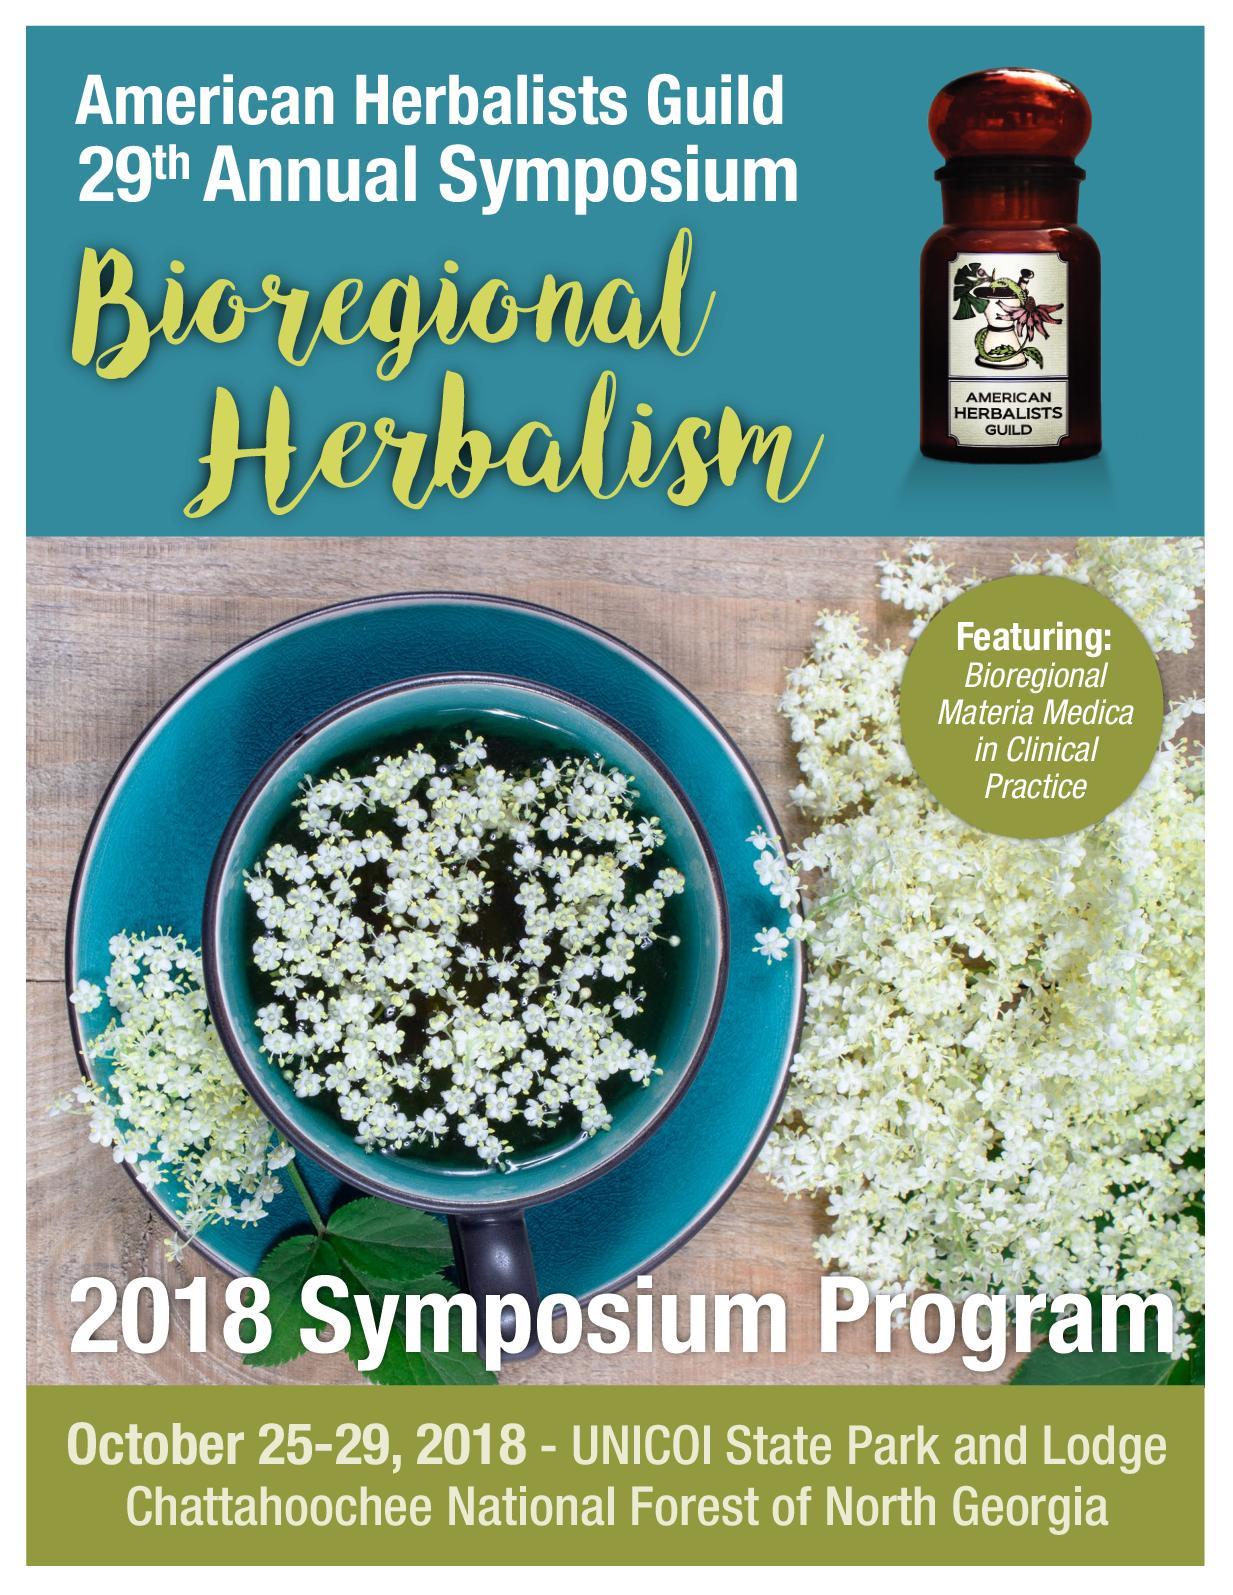 Calaméo - 2018 AHG Symposium Program